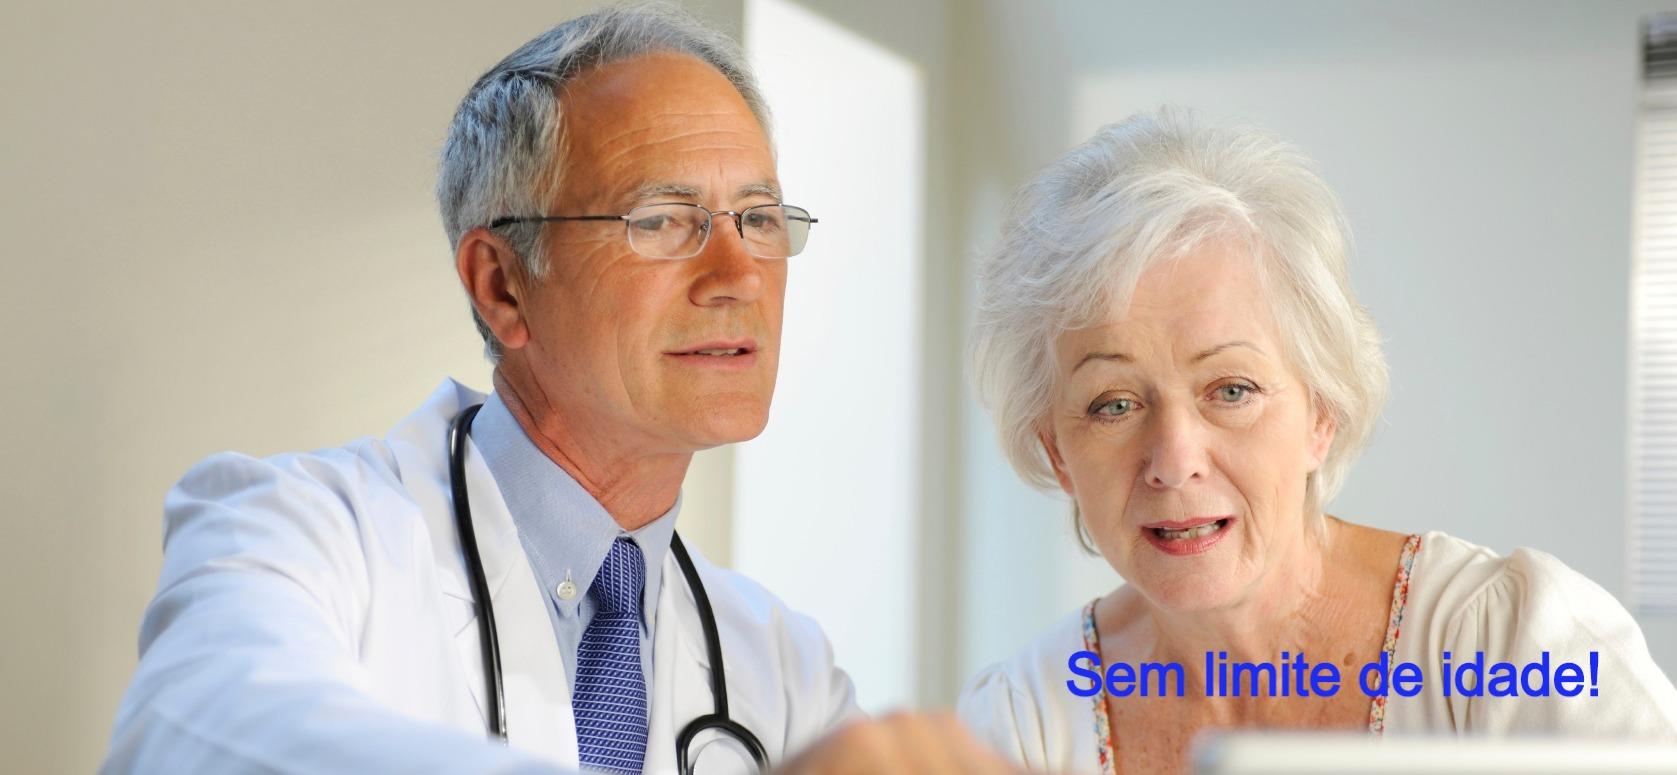 Doctor_Senior_patient_iStock_227504Mediu